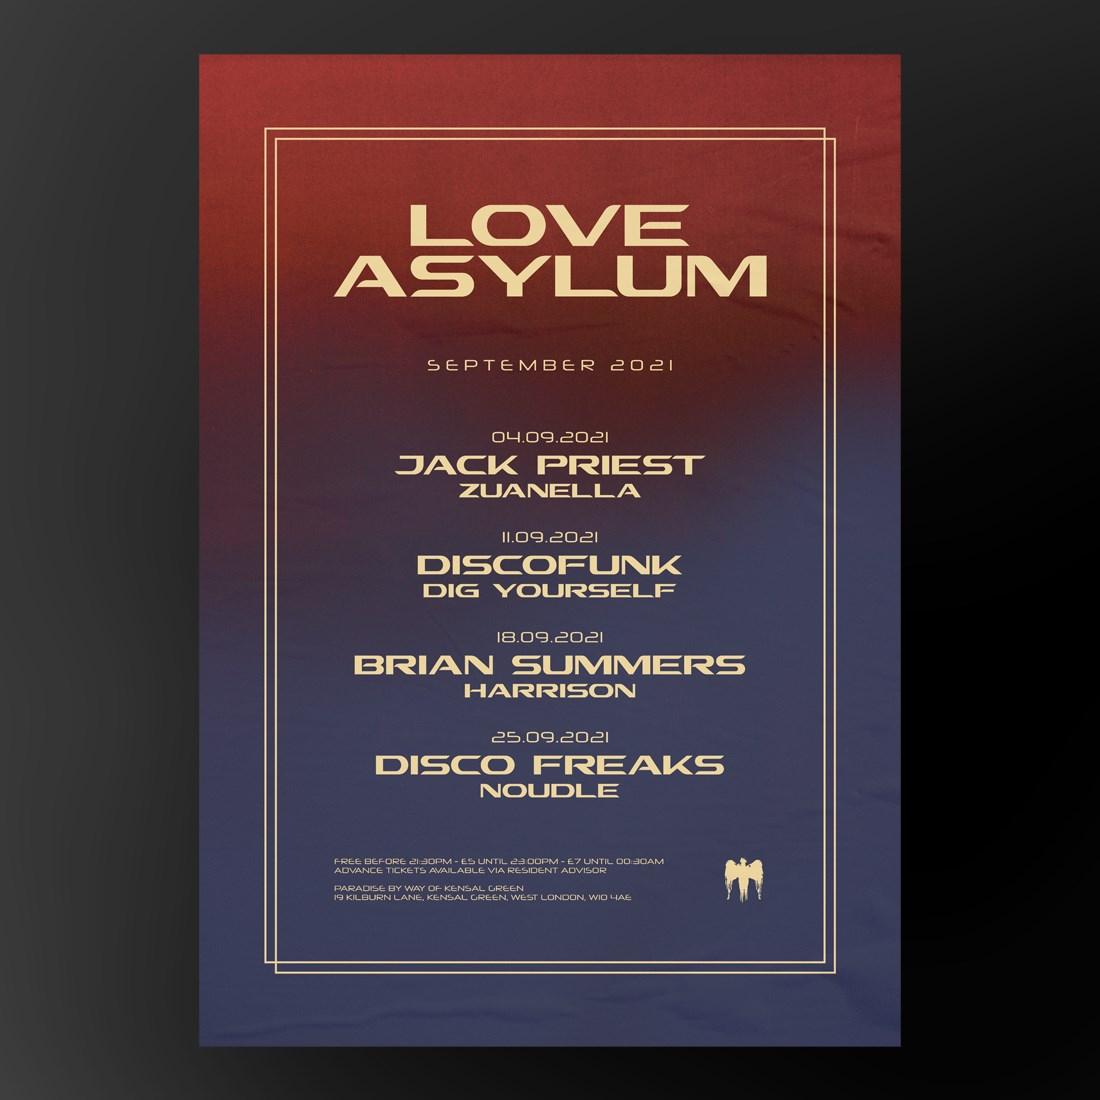 Love Asylum with Discofunk - Flyer back